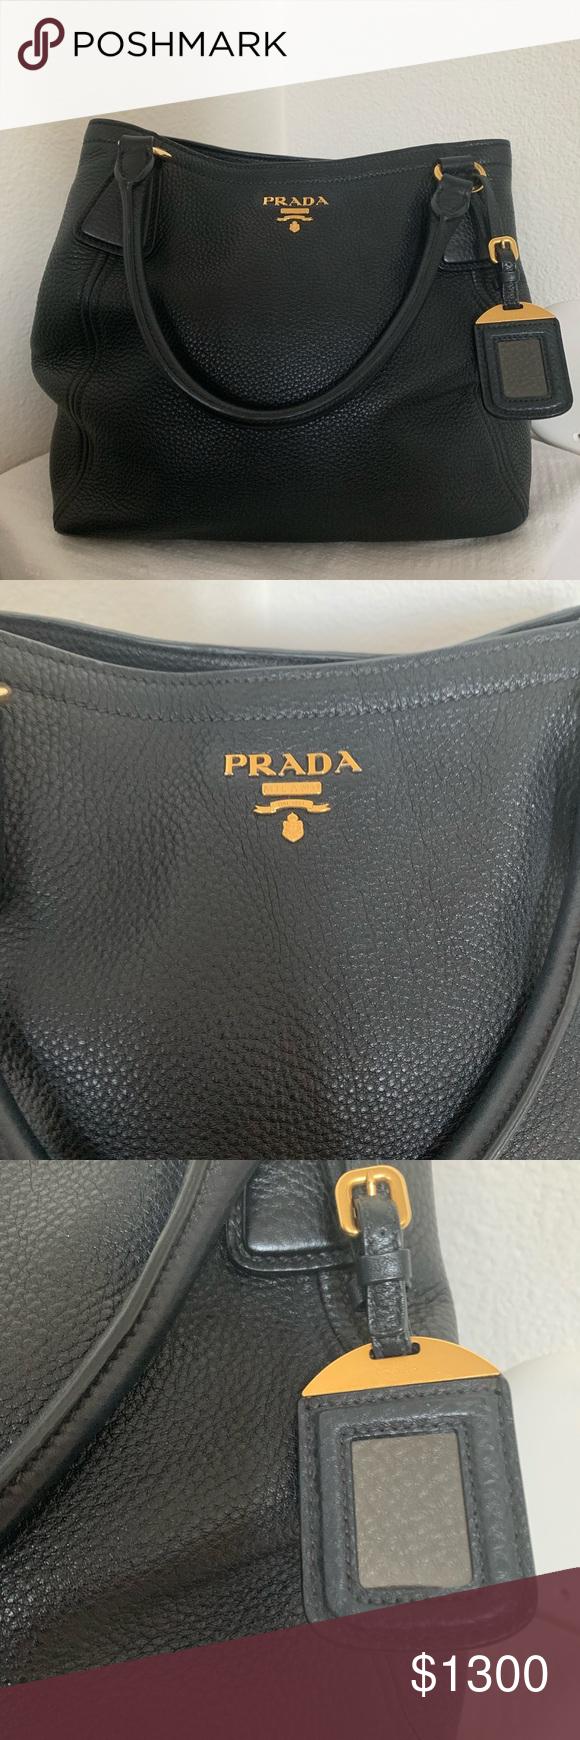 Photo of Prada Nappa Leather Black Handbag Purse Beautiful Prada handbag in pebbled leath…